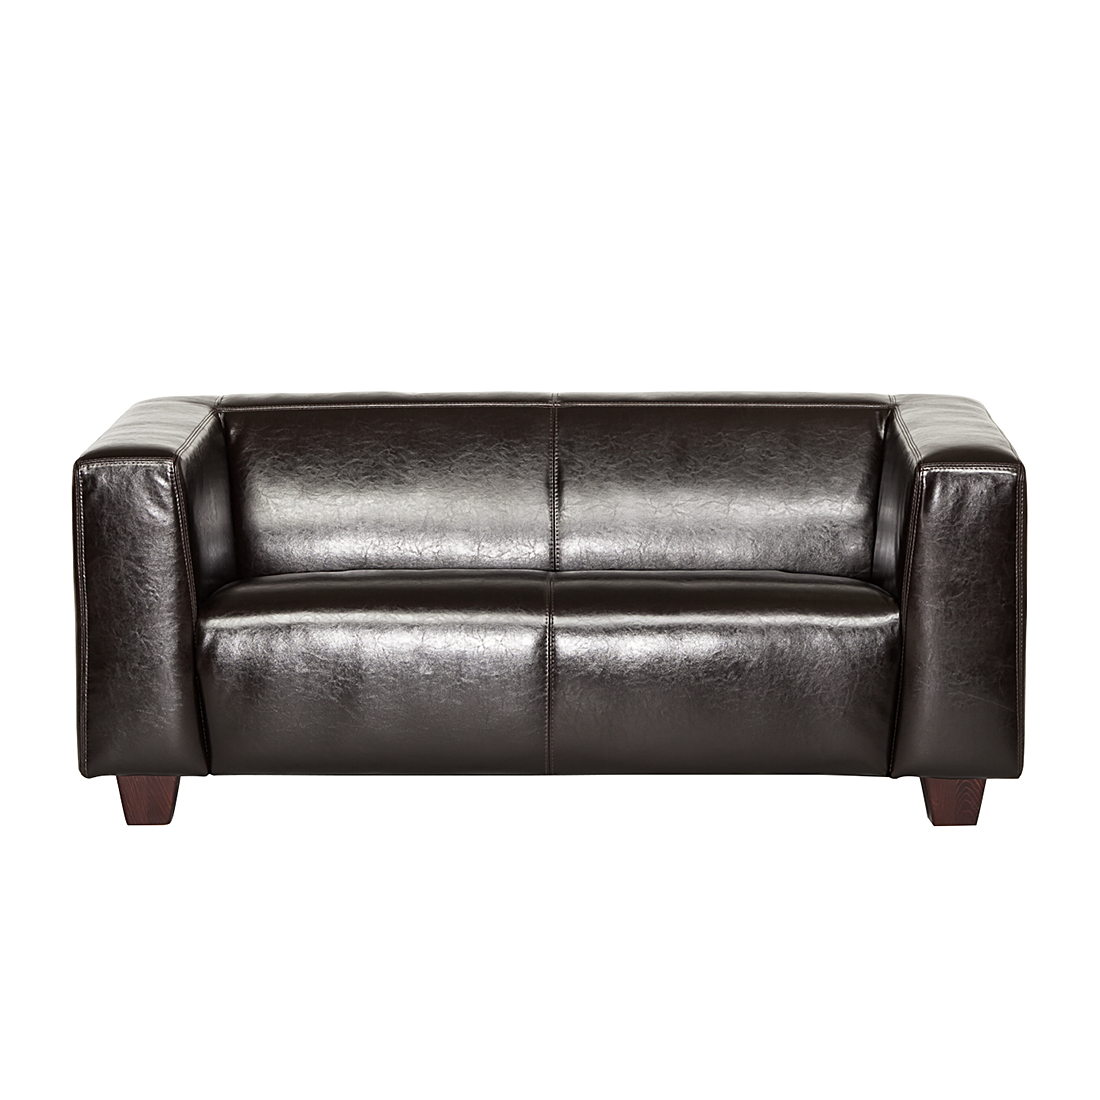 ledersofa sofa 2 sitzer echtleder braun couch leder einzelsofa dunkelbraun neu ebay. Black Bedroom Furniture Sets. Home Design Ideas